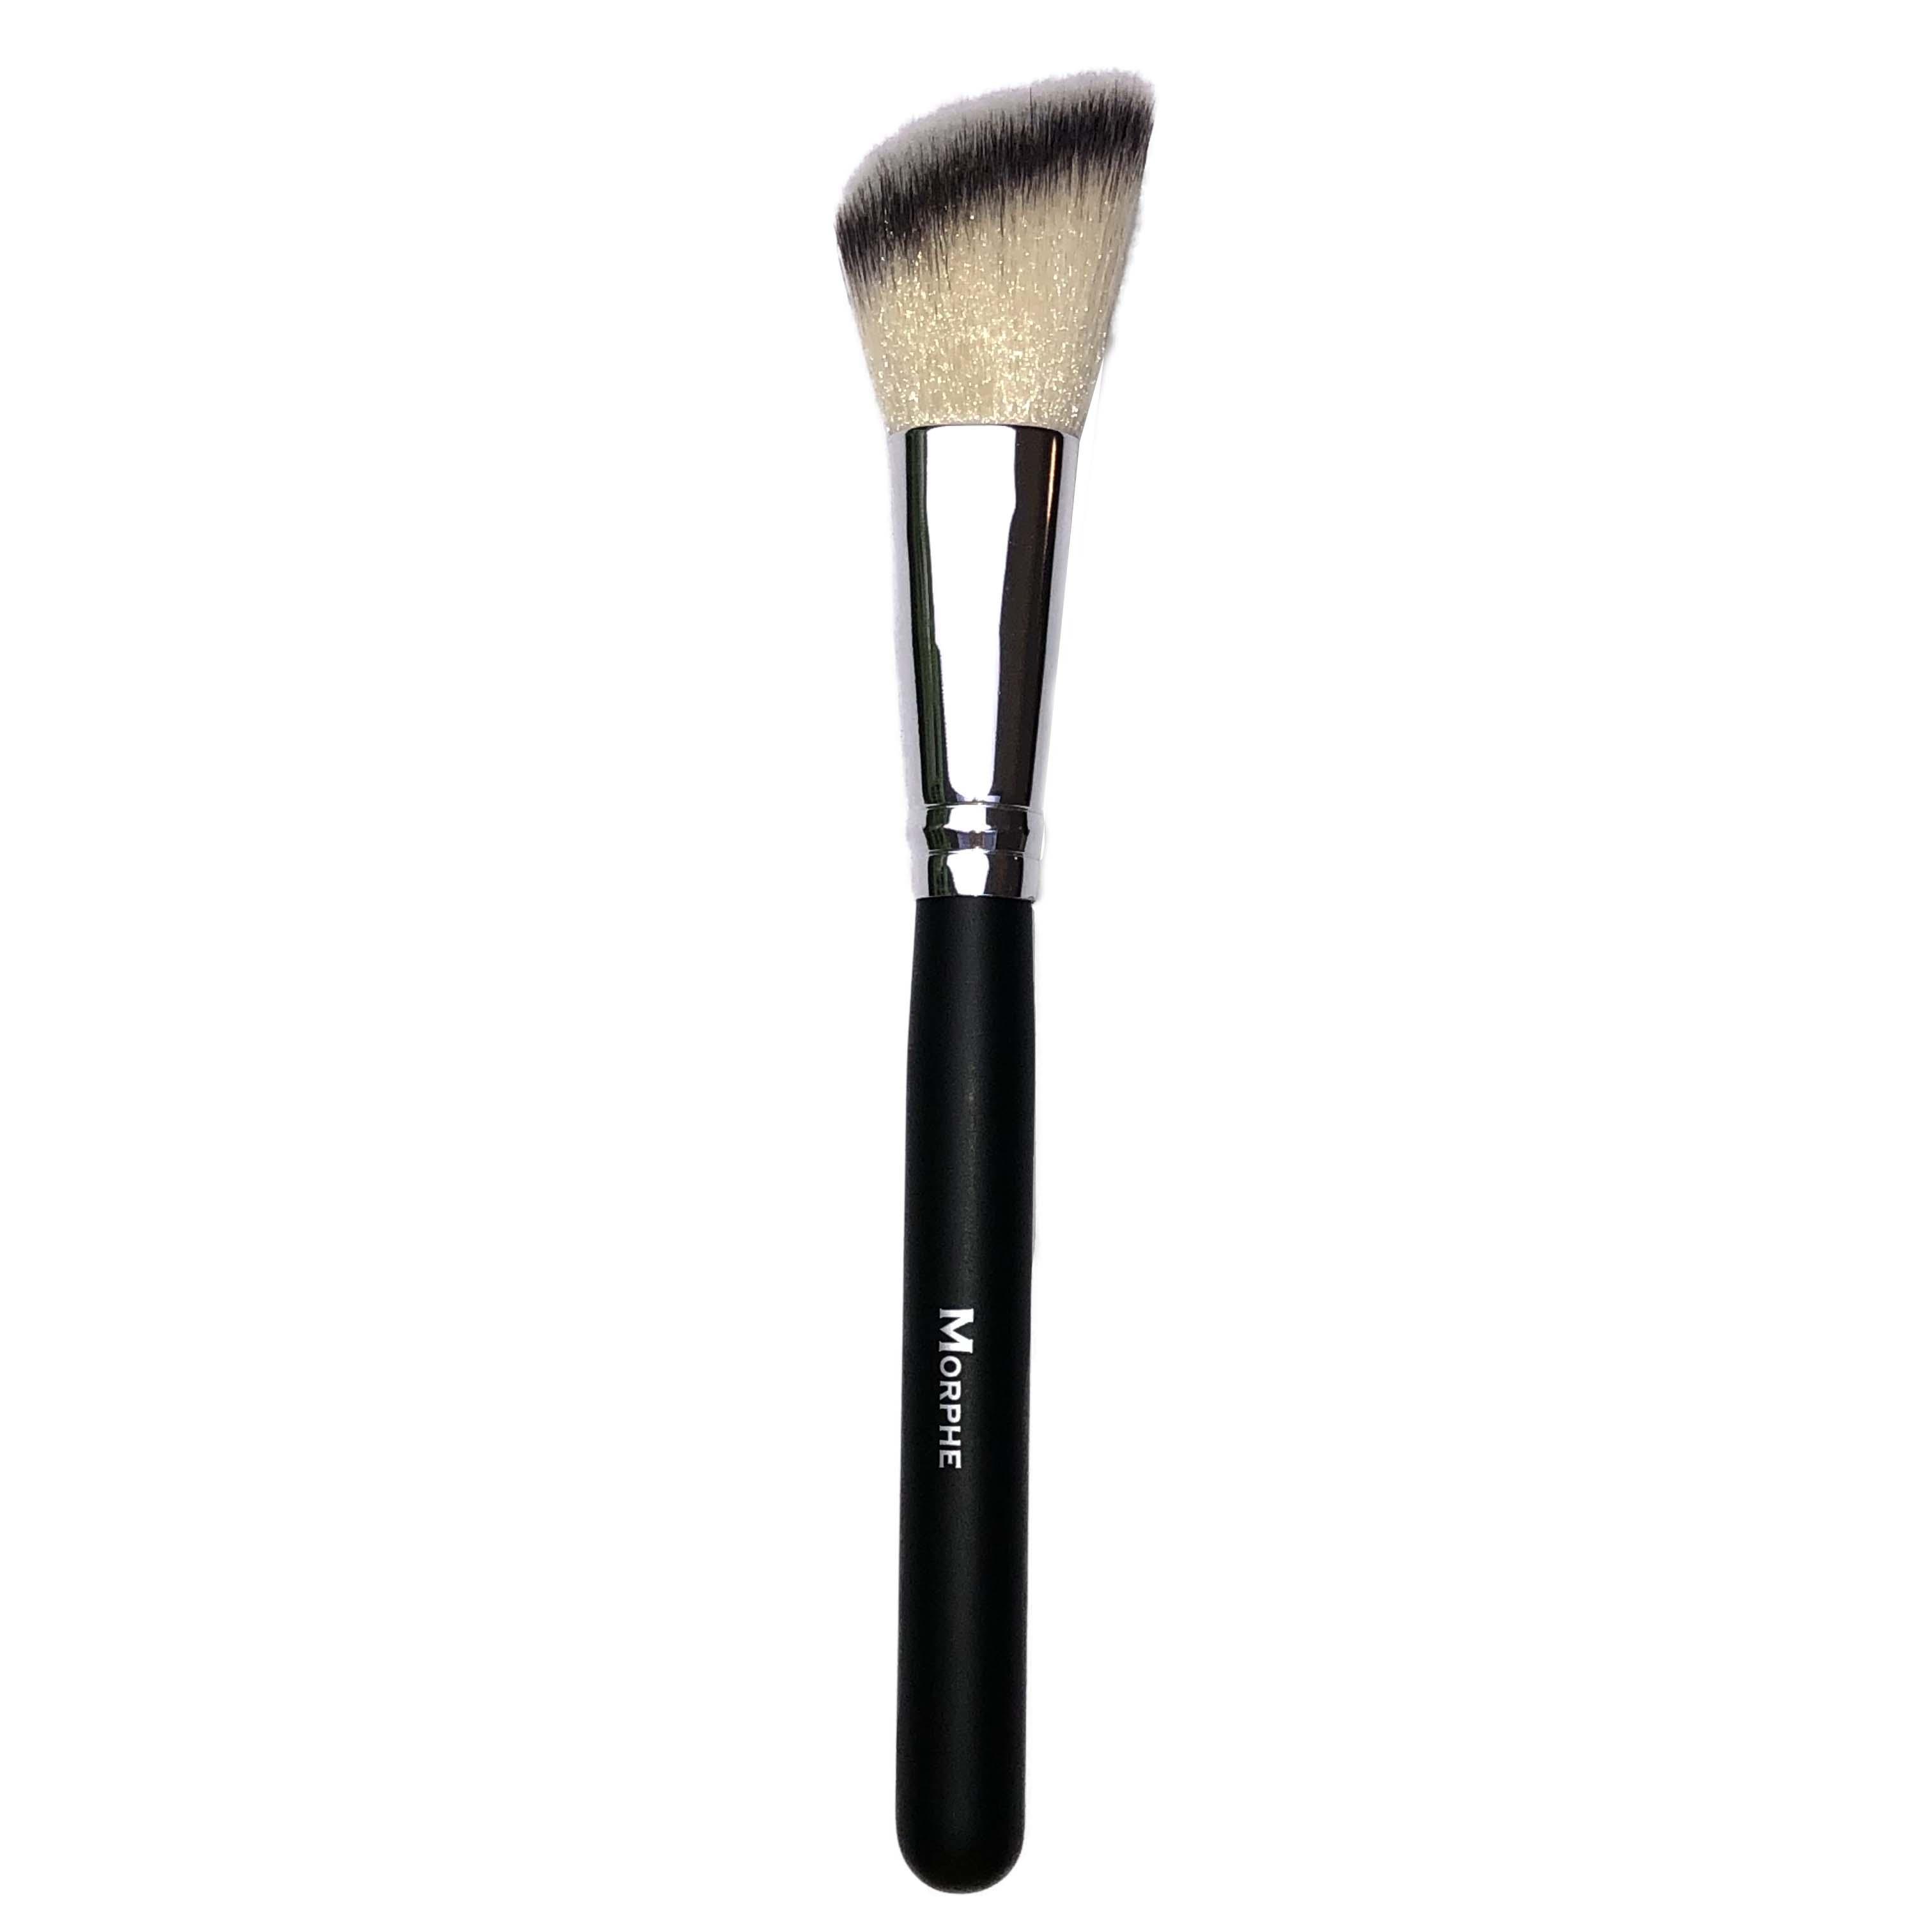 Morphe Large Fluffy Blush Brush Black